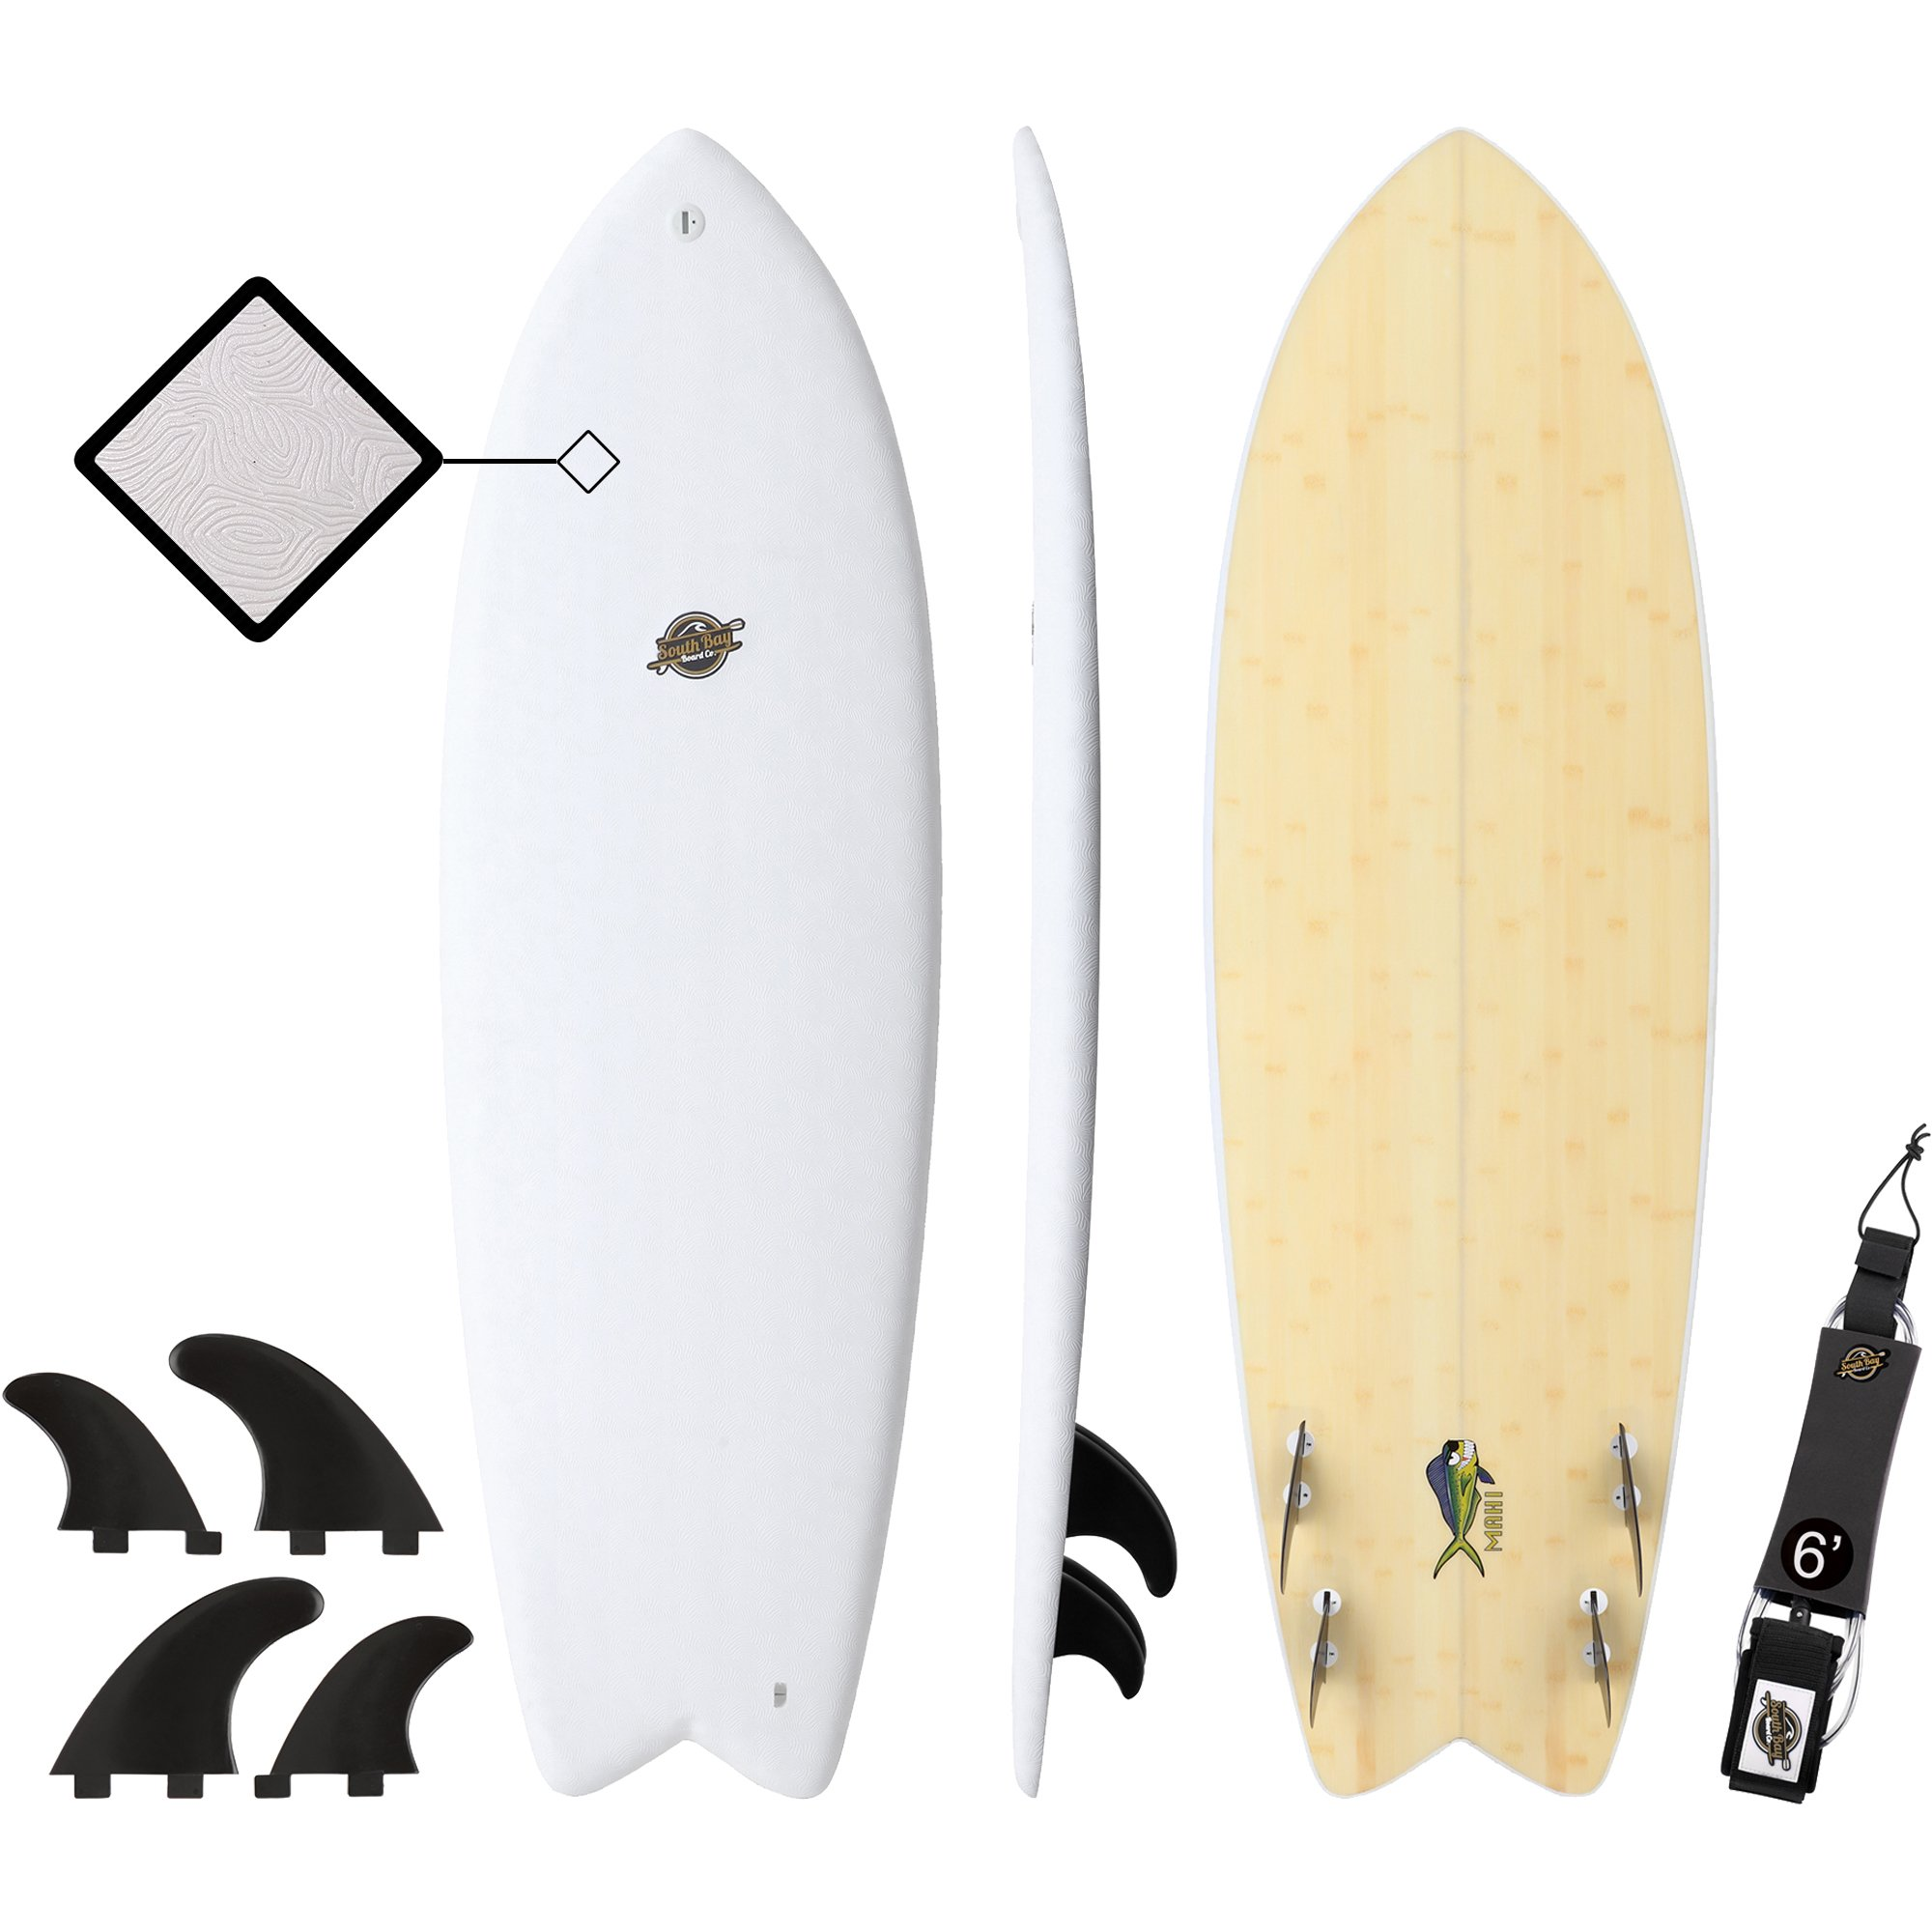 5\'8 Mahi Hybrid Soft Top Surfboard - Walmart.com